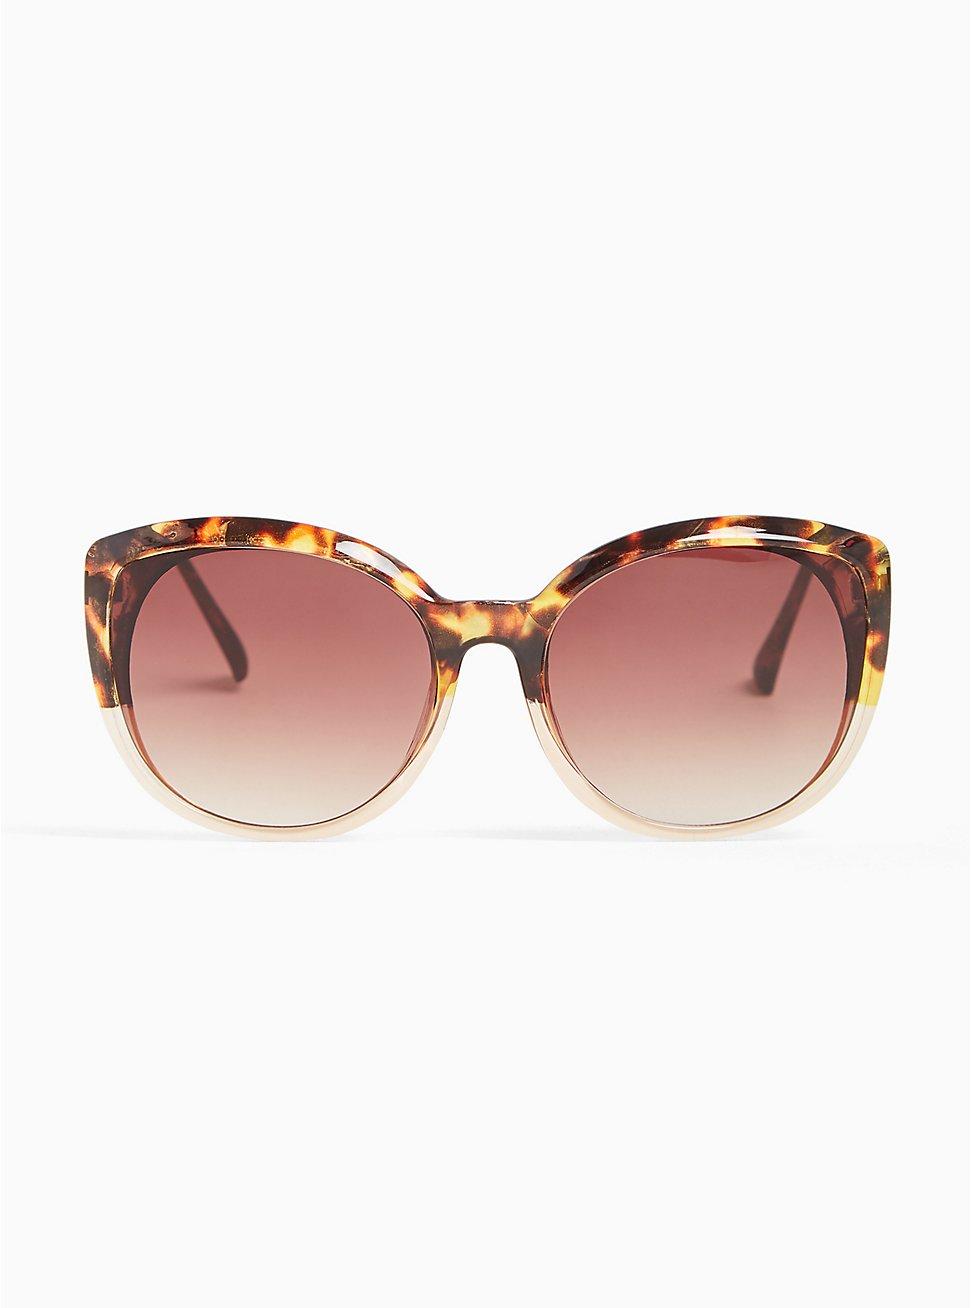 Tortoiseshell Cat Eye Sunglasses, , hi-res